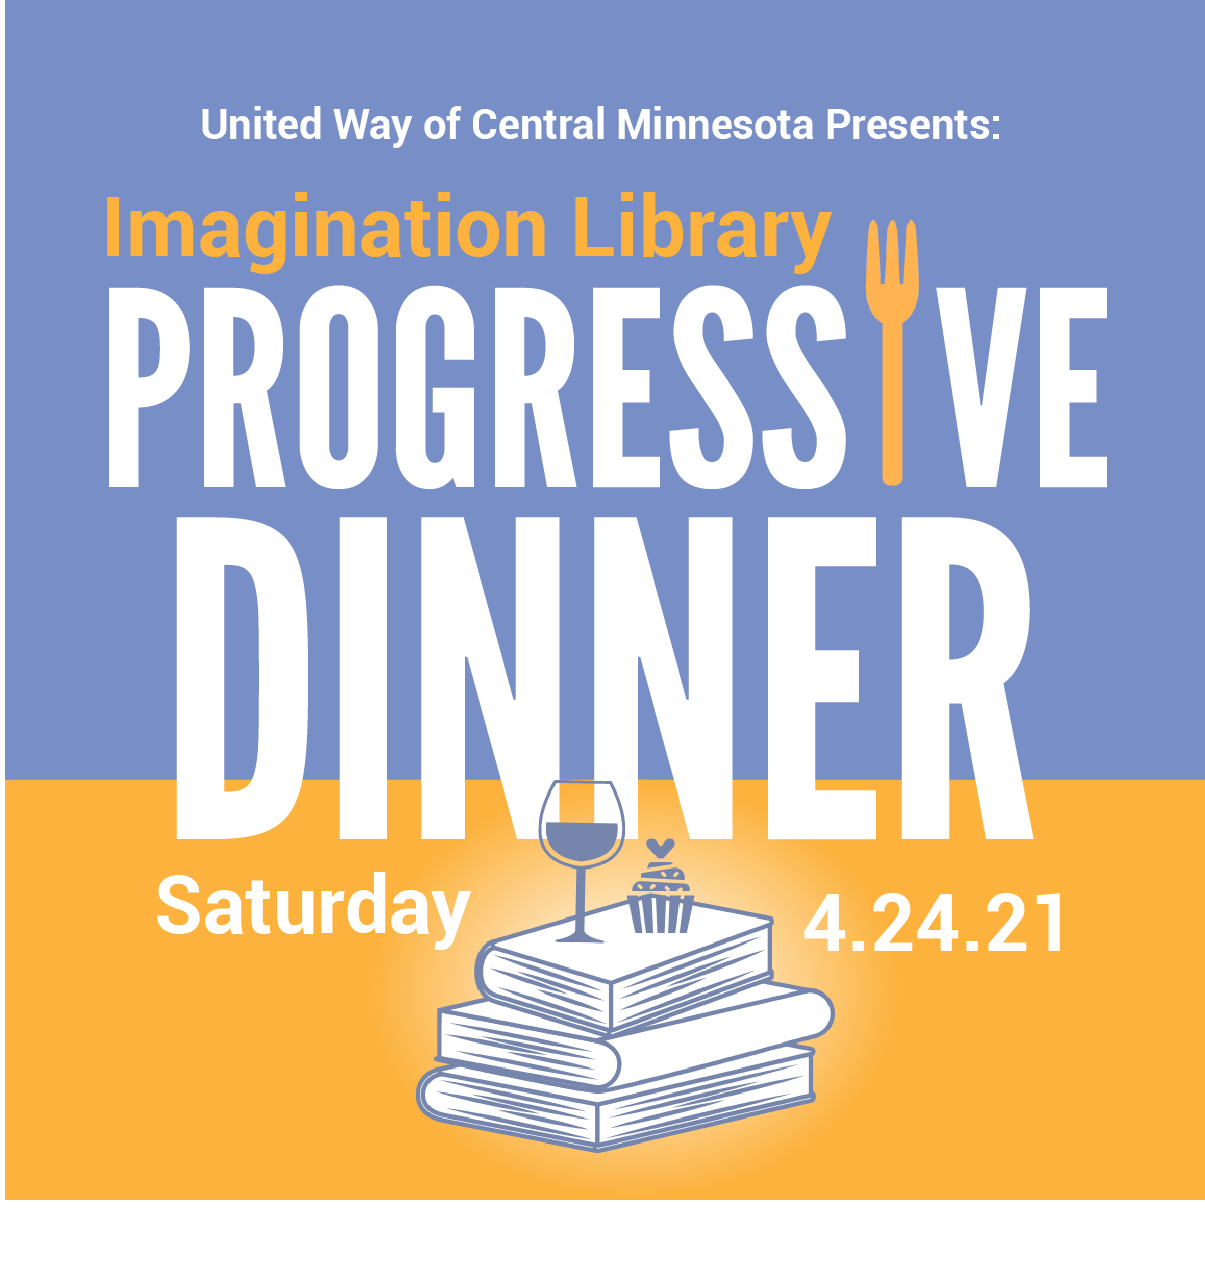 Imagination Library Progressive Dinner